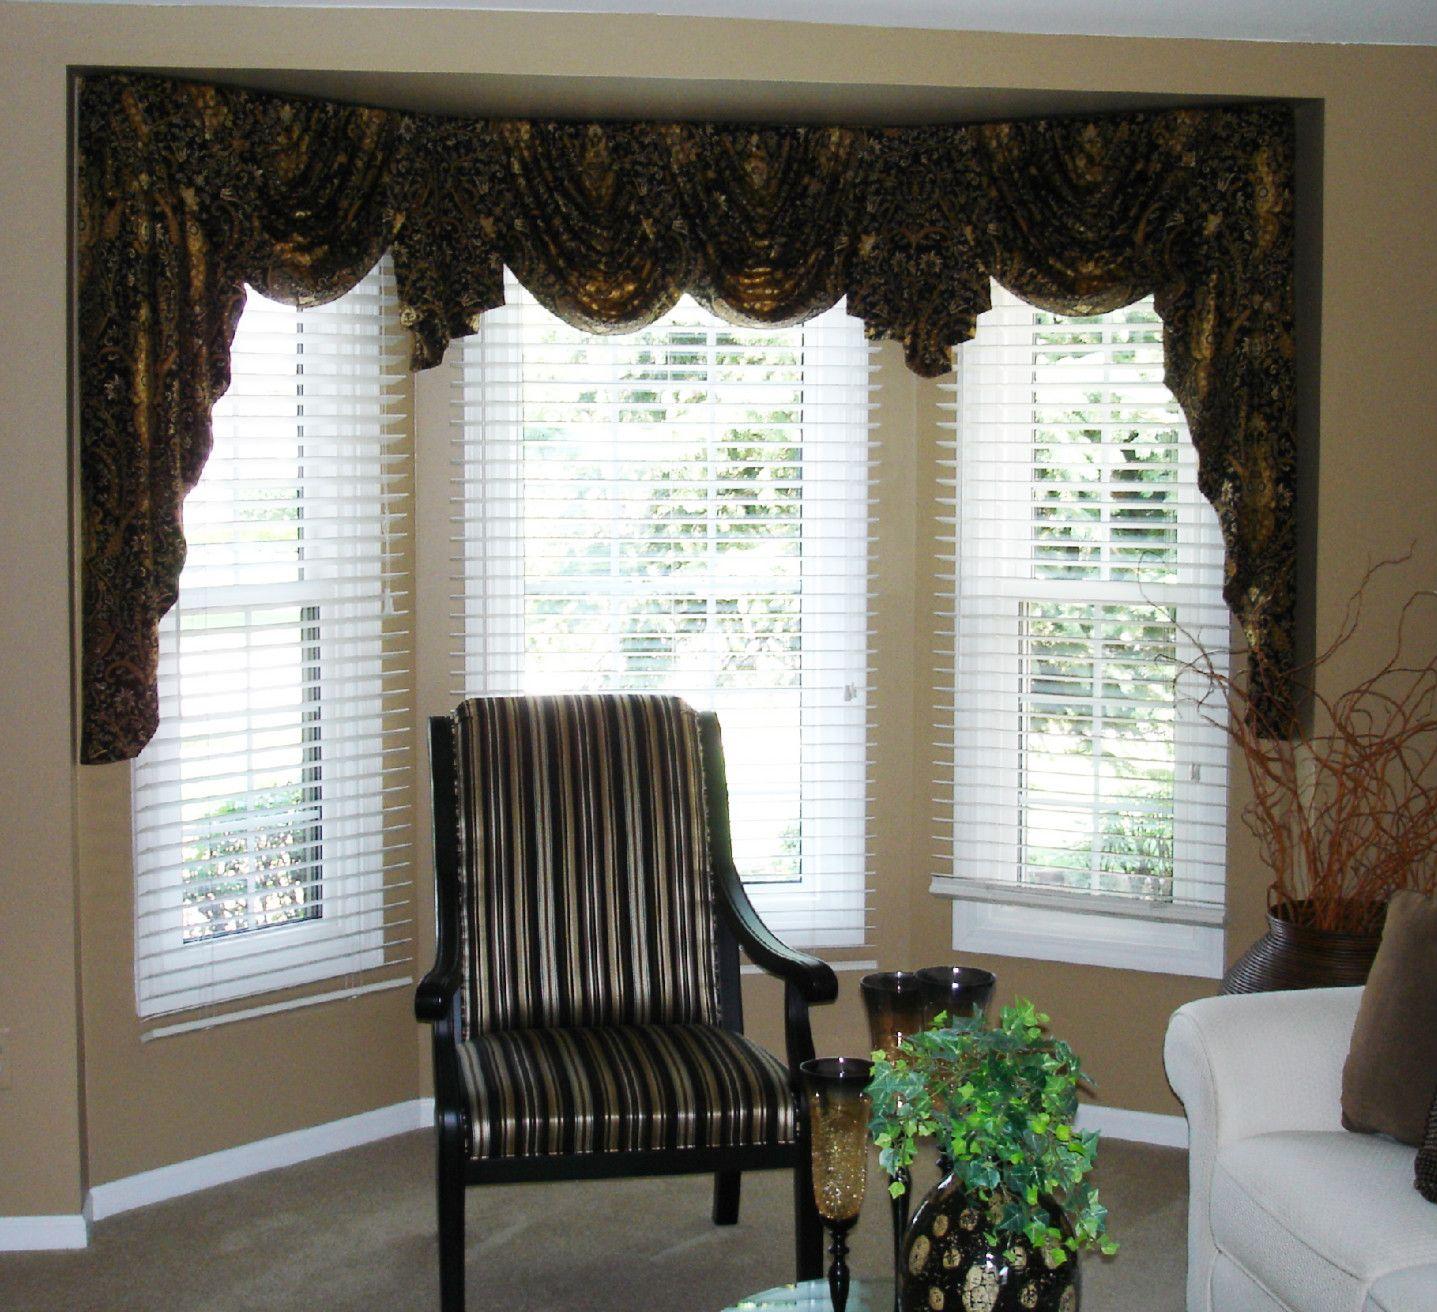 20 Living Room Window Valances Magzhouse, Valances For Living Room